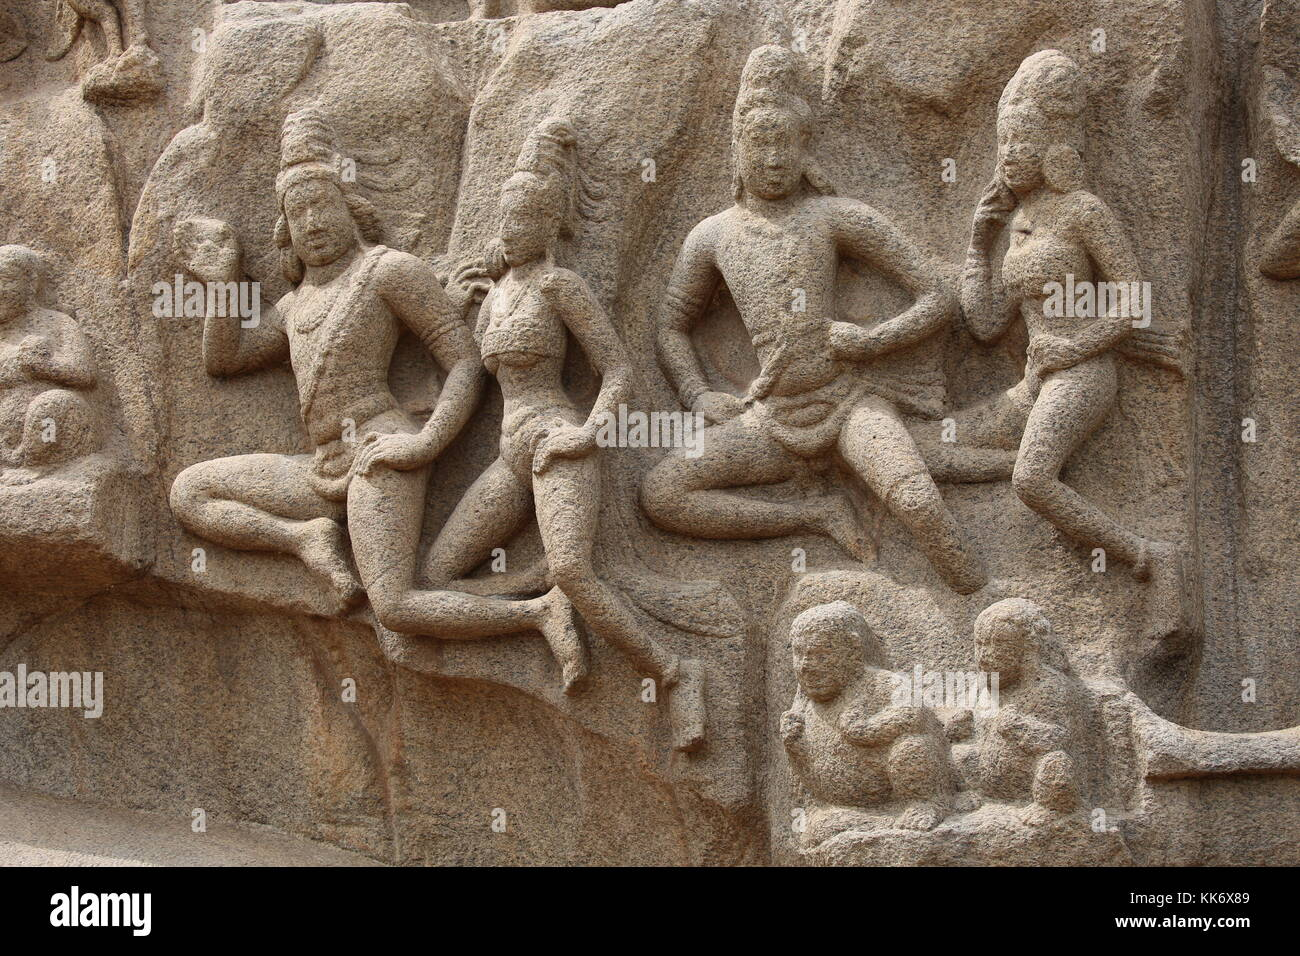 Arjunas Buße in Mahabalipuram, mamallapuram, Tamil Nadu, Indien, Steinornamente mit Elefanten Stockbild